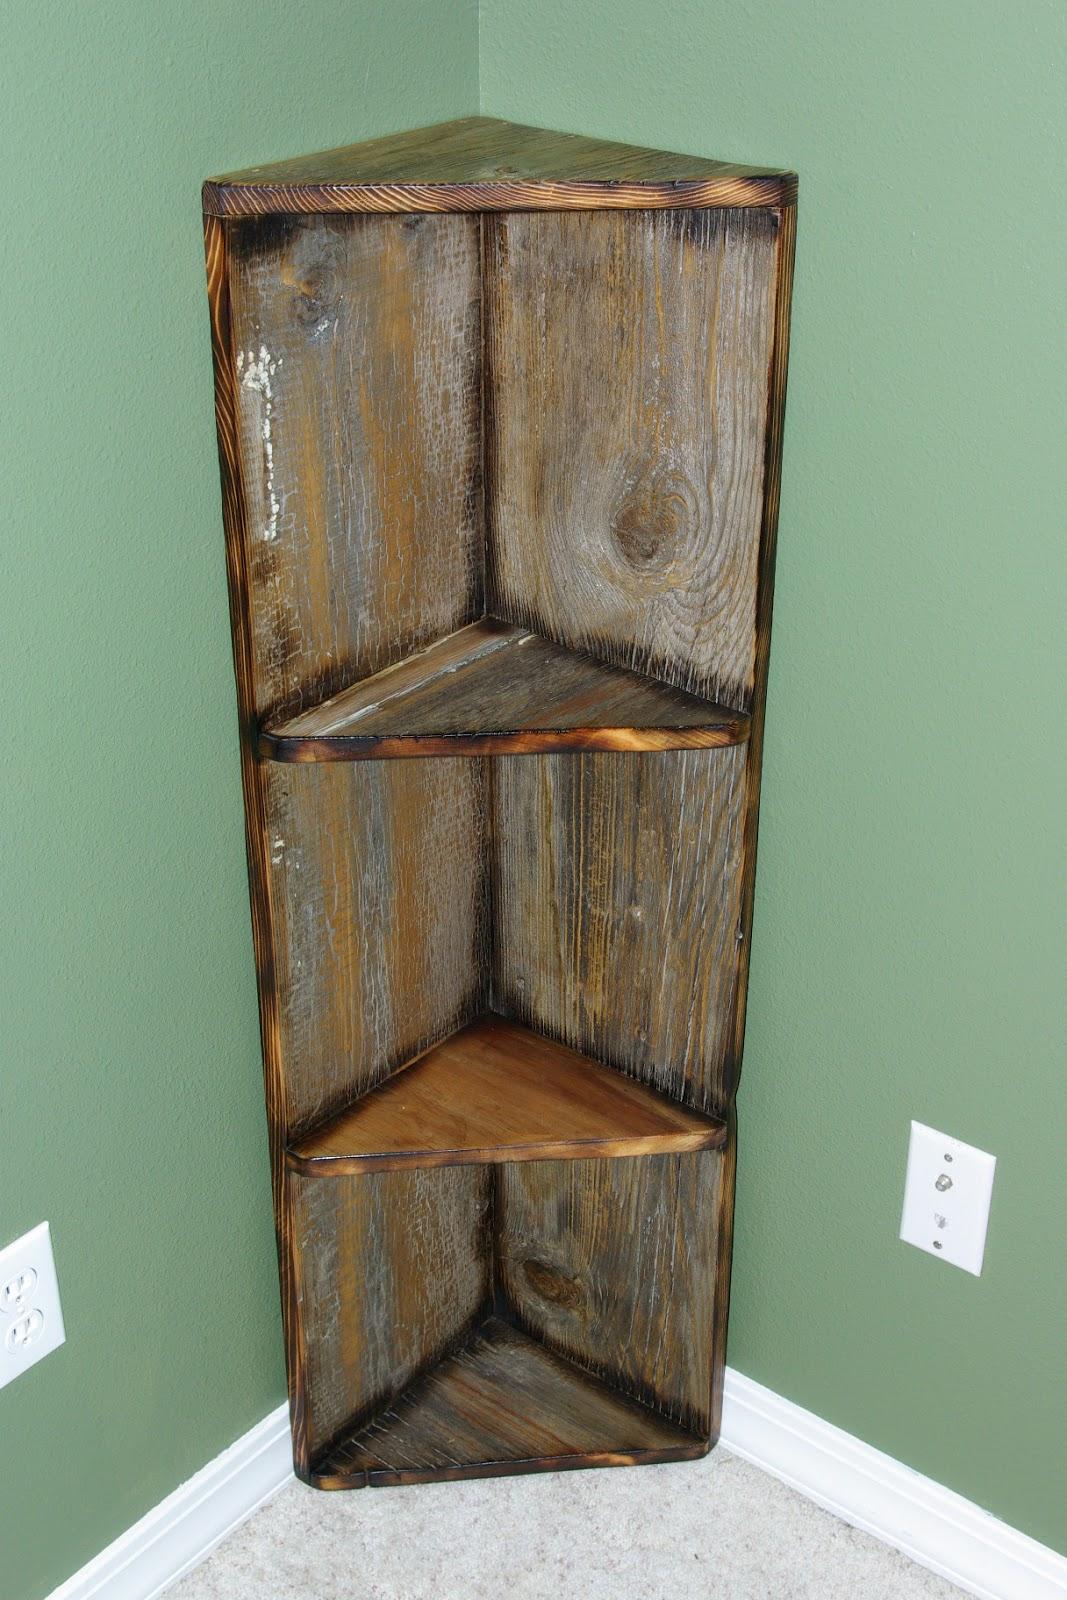 Reclaimed Rustics Barn Wood Corner Shelf